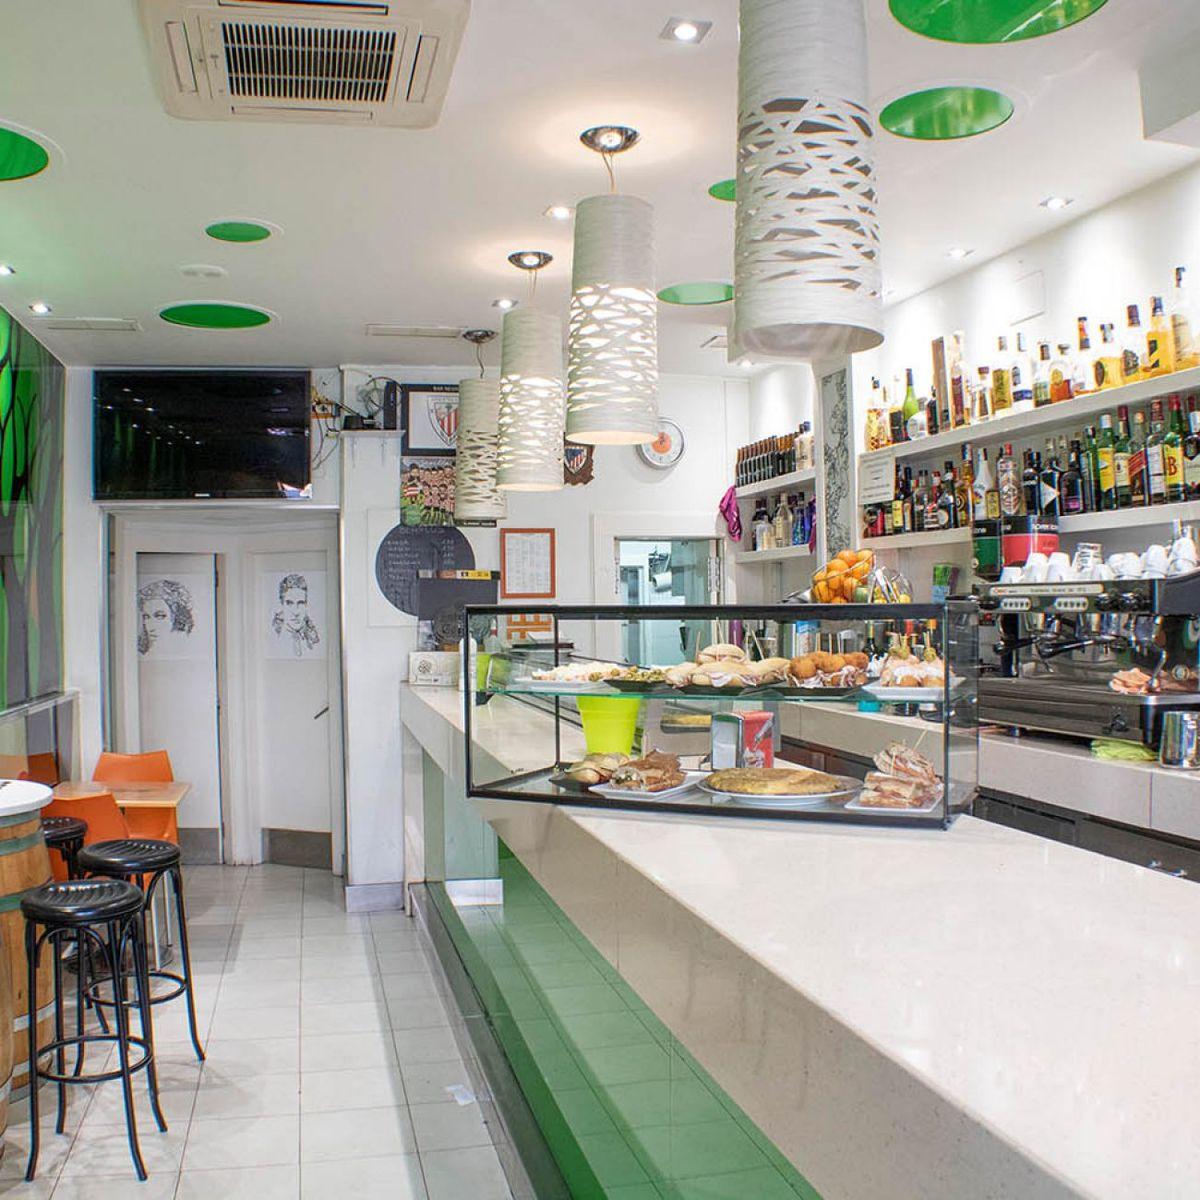 Bar Negresco en la Plaza nueva de Bilbao